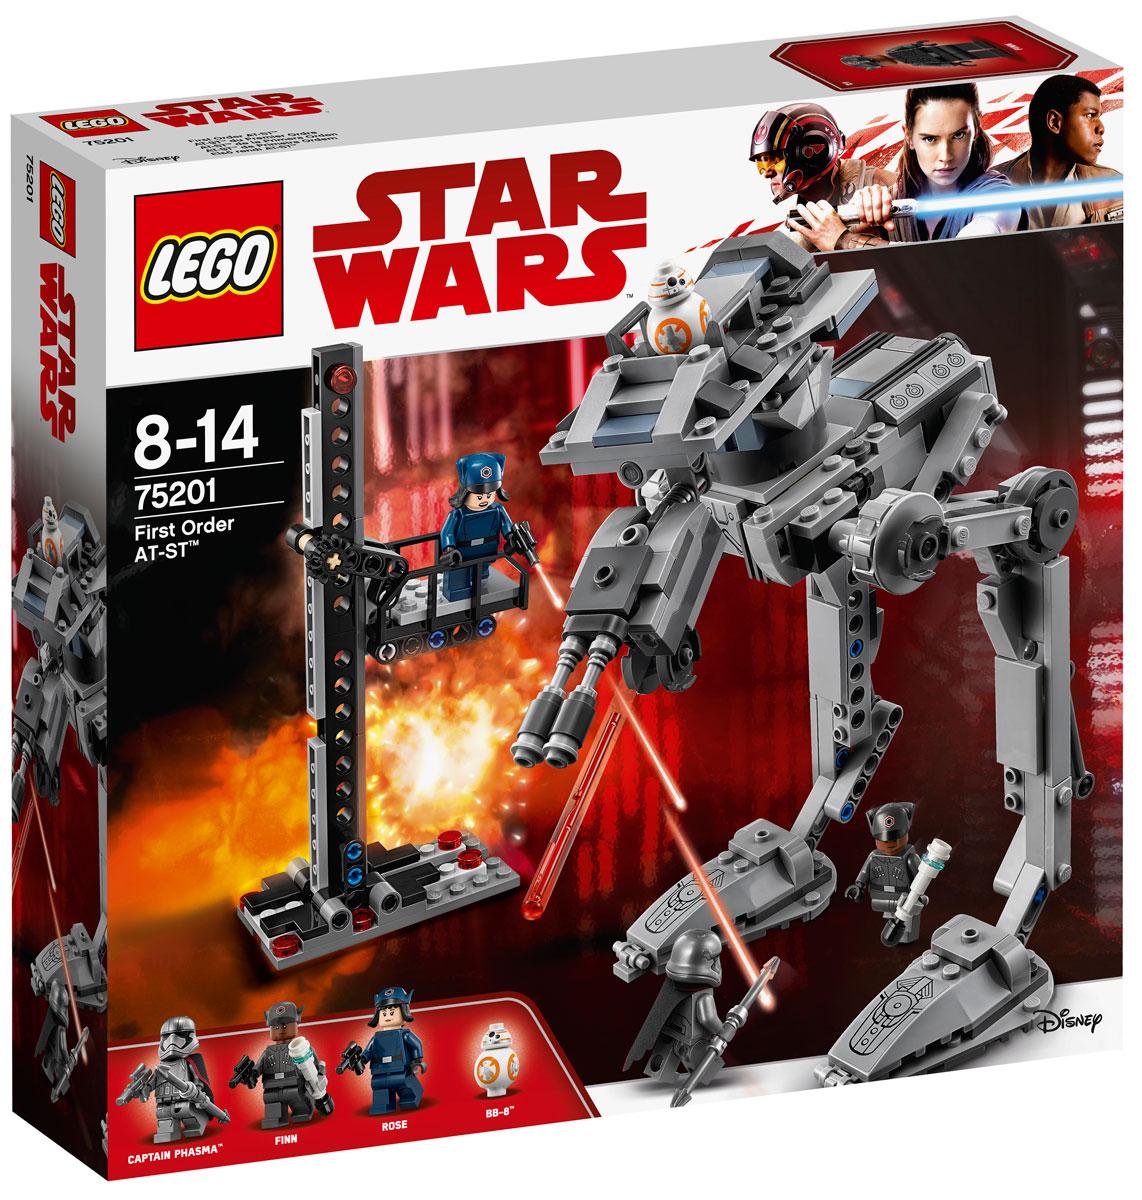 LEGO Star Wars 75201 Вездеход AT-ST Первого Ордена Конструктор конструктор lego 75201 вездеход at st первого ордена